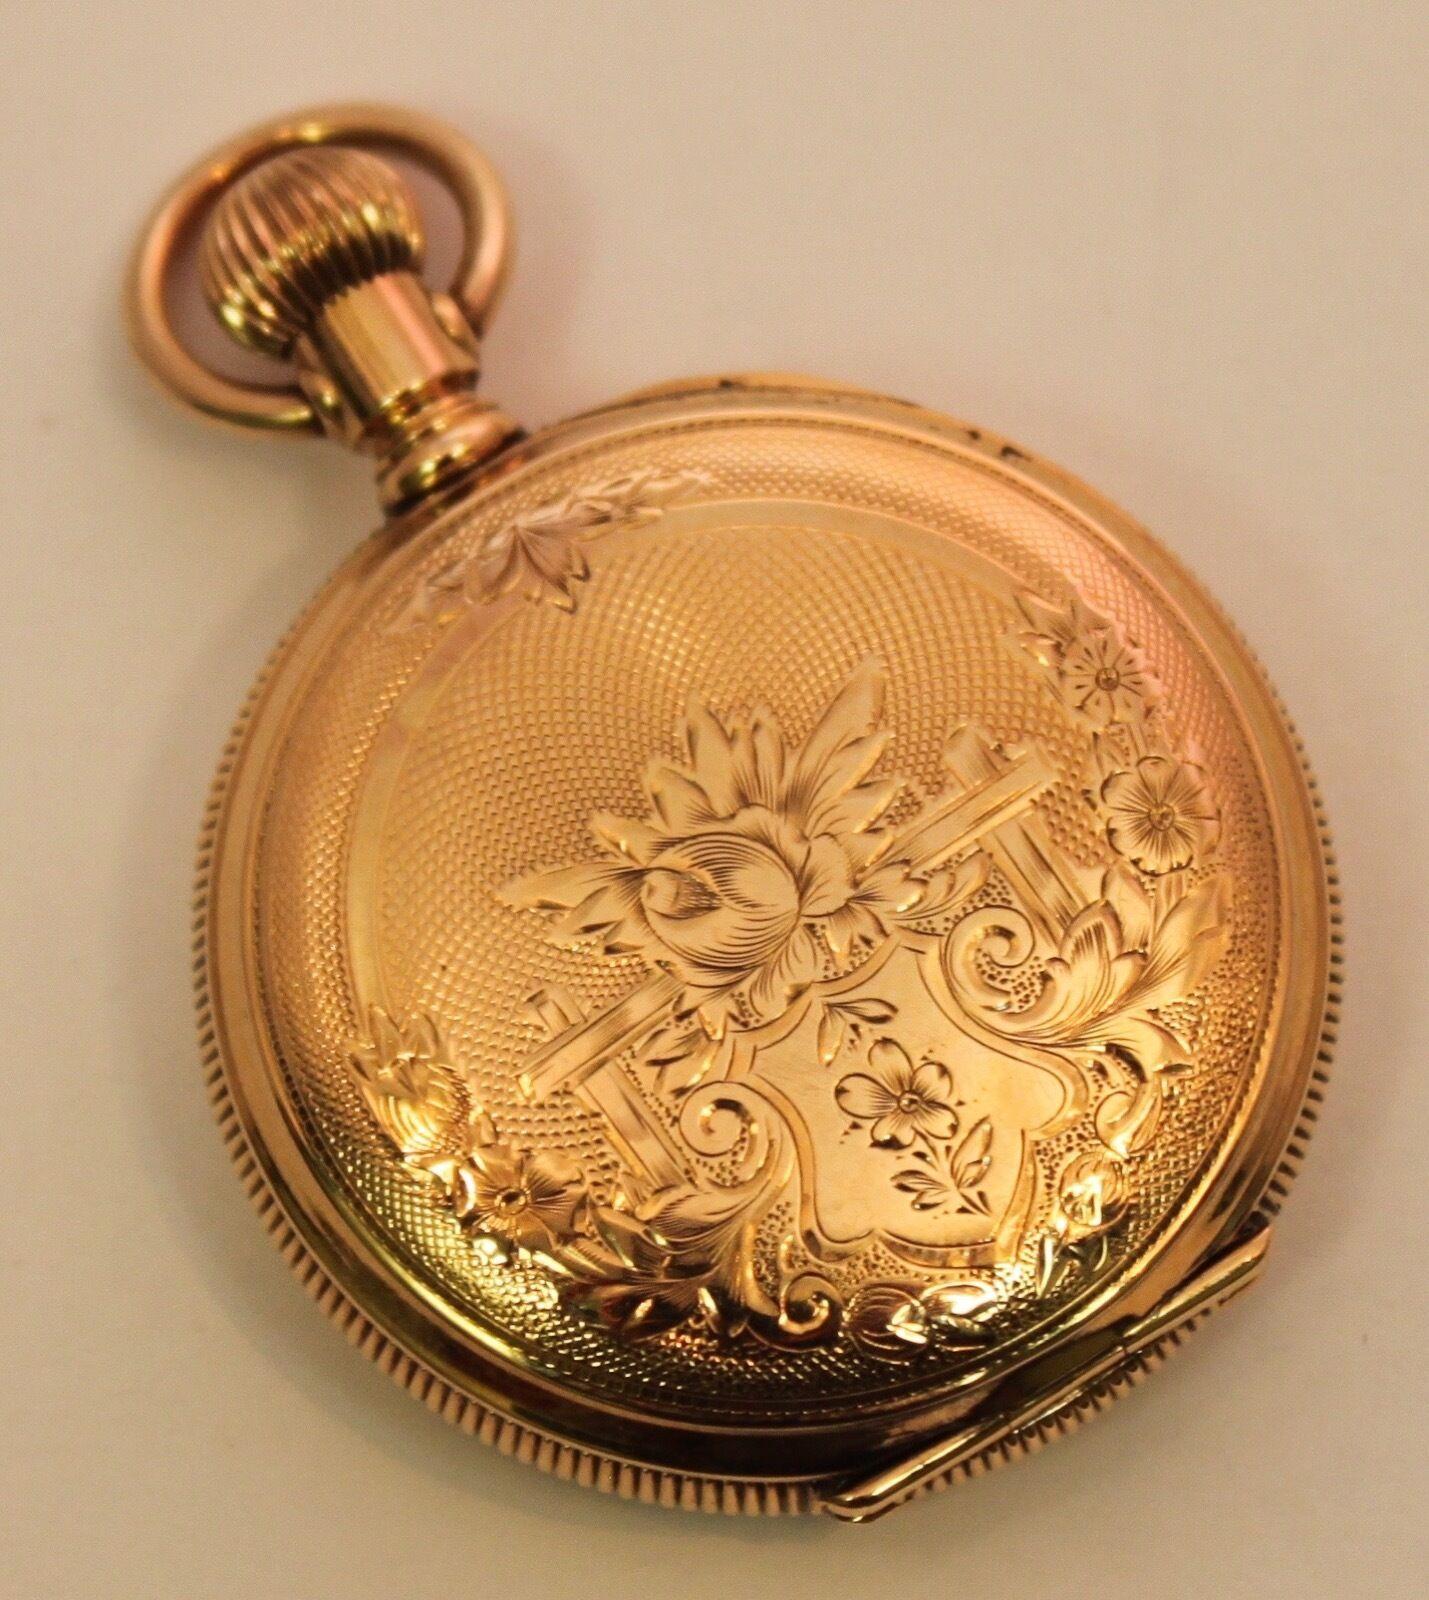 Vintage Elgin 14K Solid Yellow Gold 35mm Hunter Pocket-Watch 34 Grams 1900s?